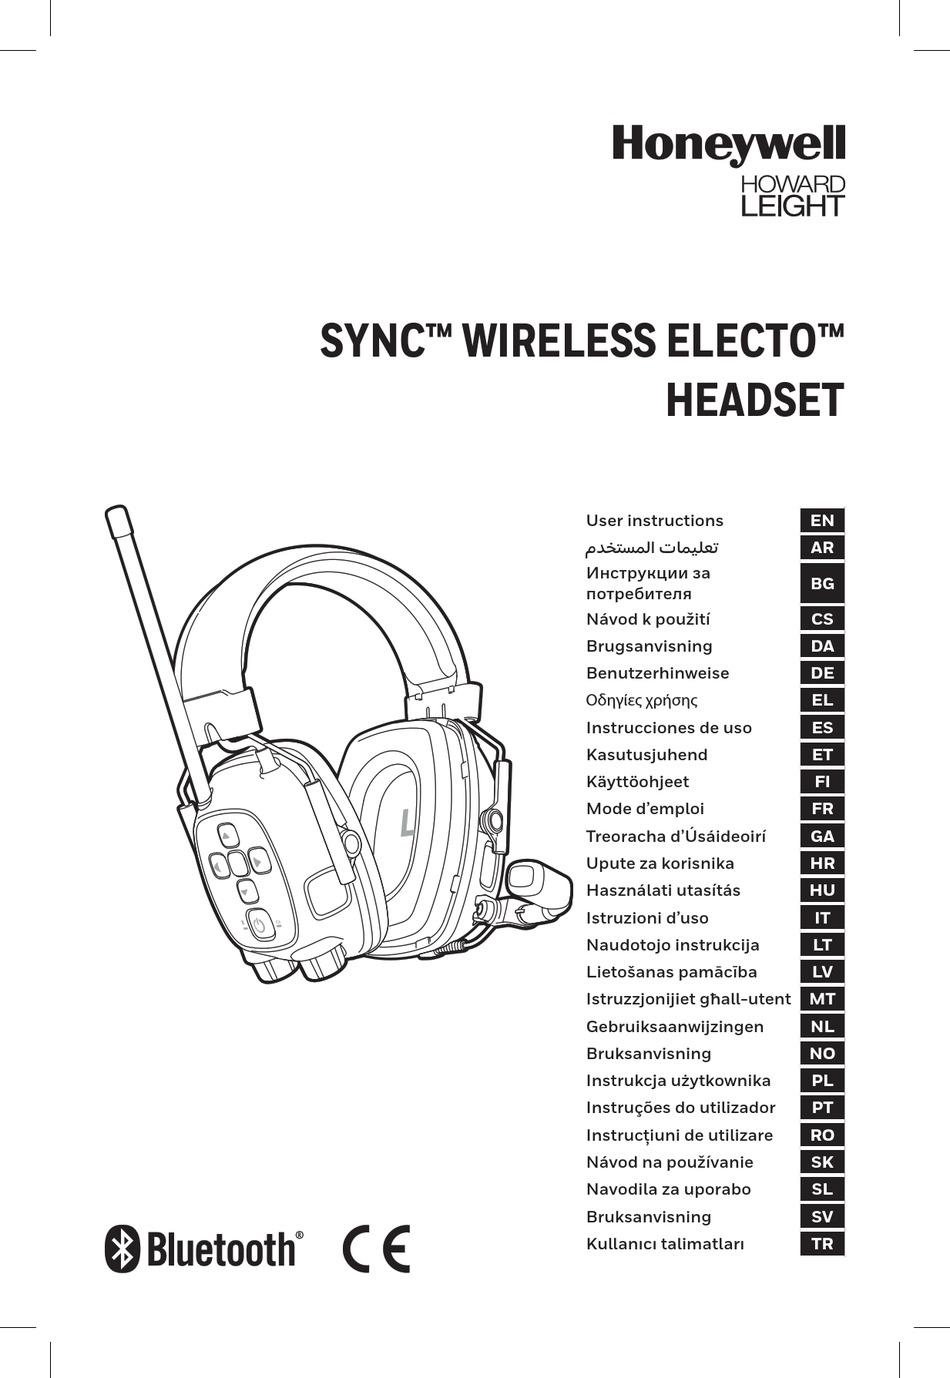 HONEYWELL SYNC WIRELESS ELECTO USER INSTRUCTIONS Pdf